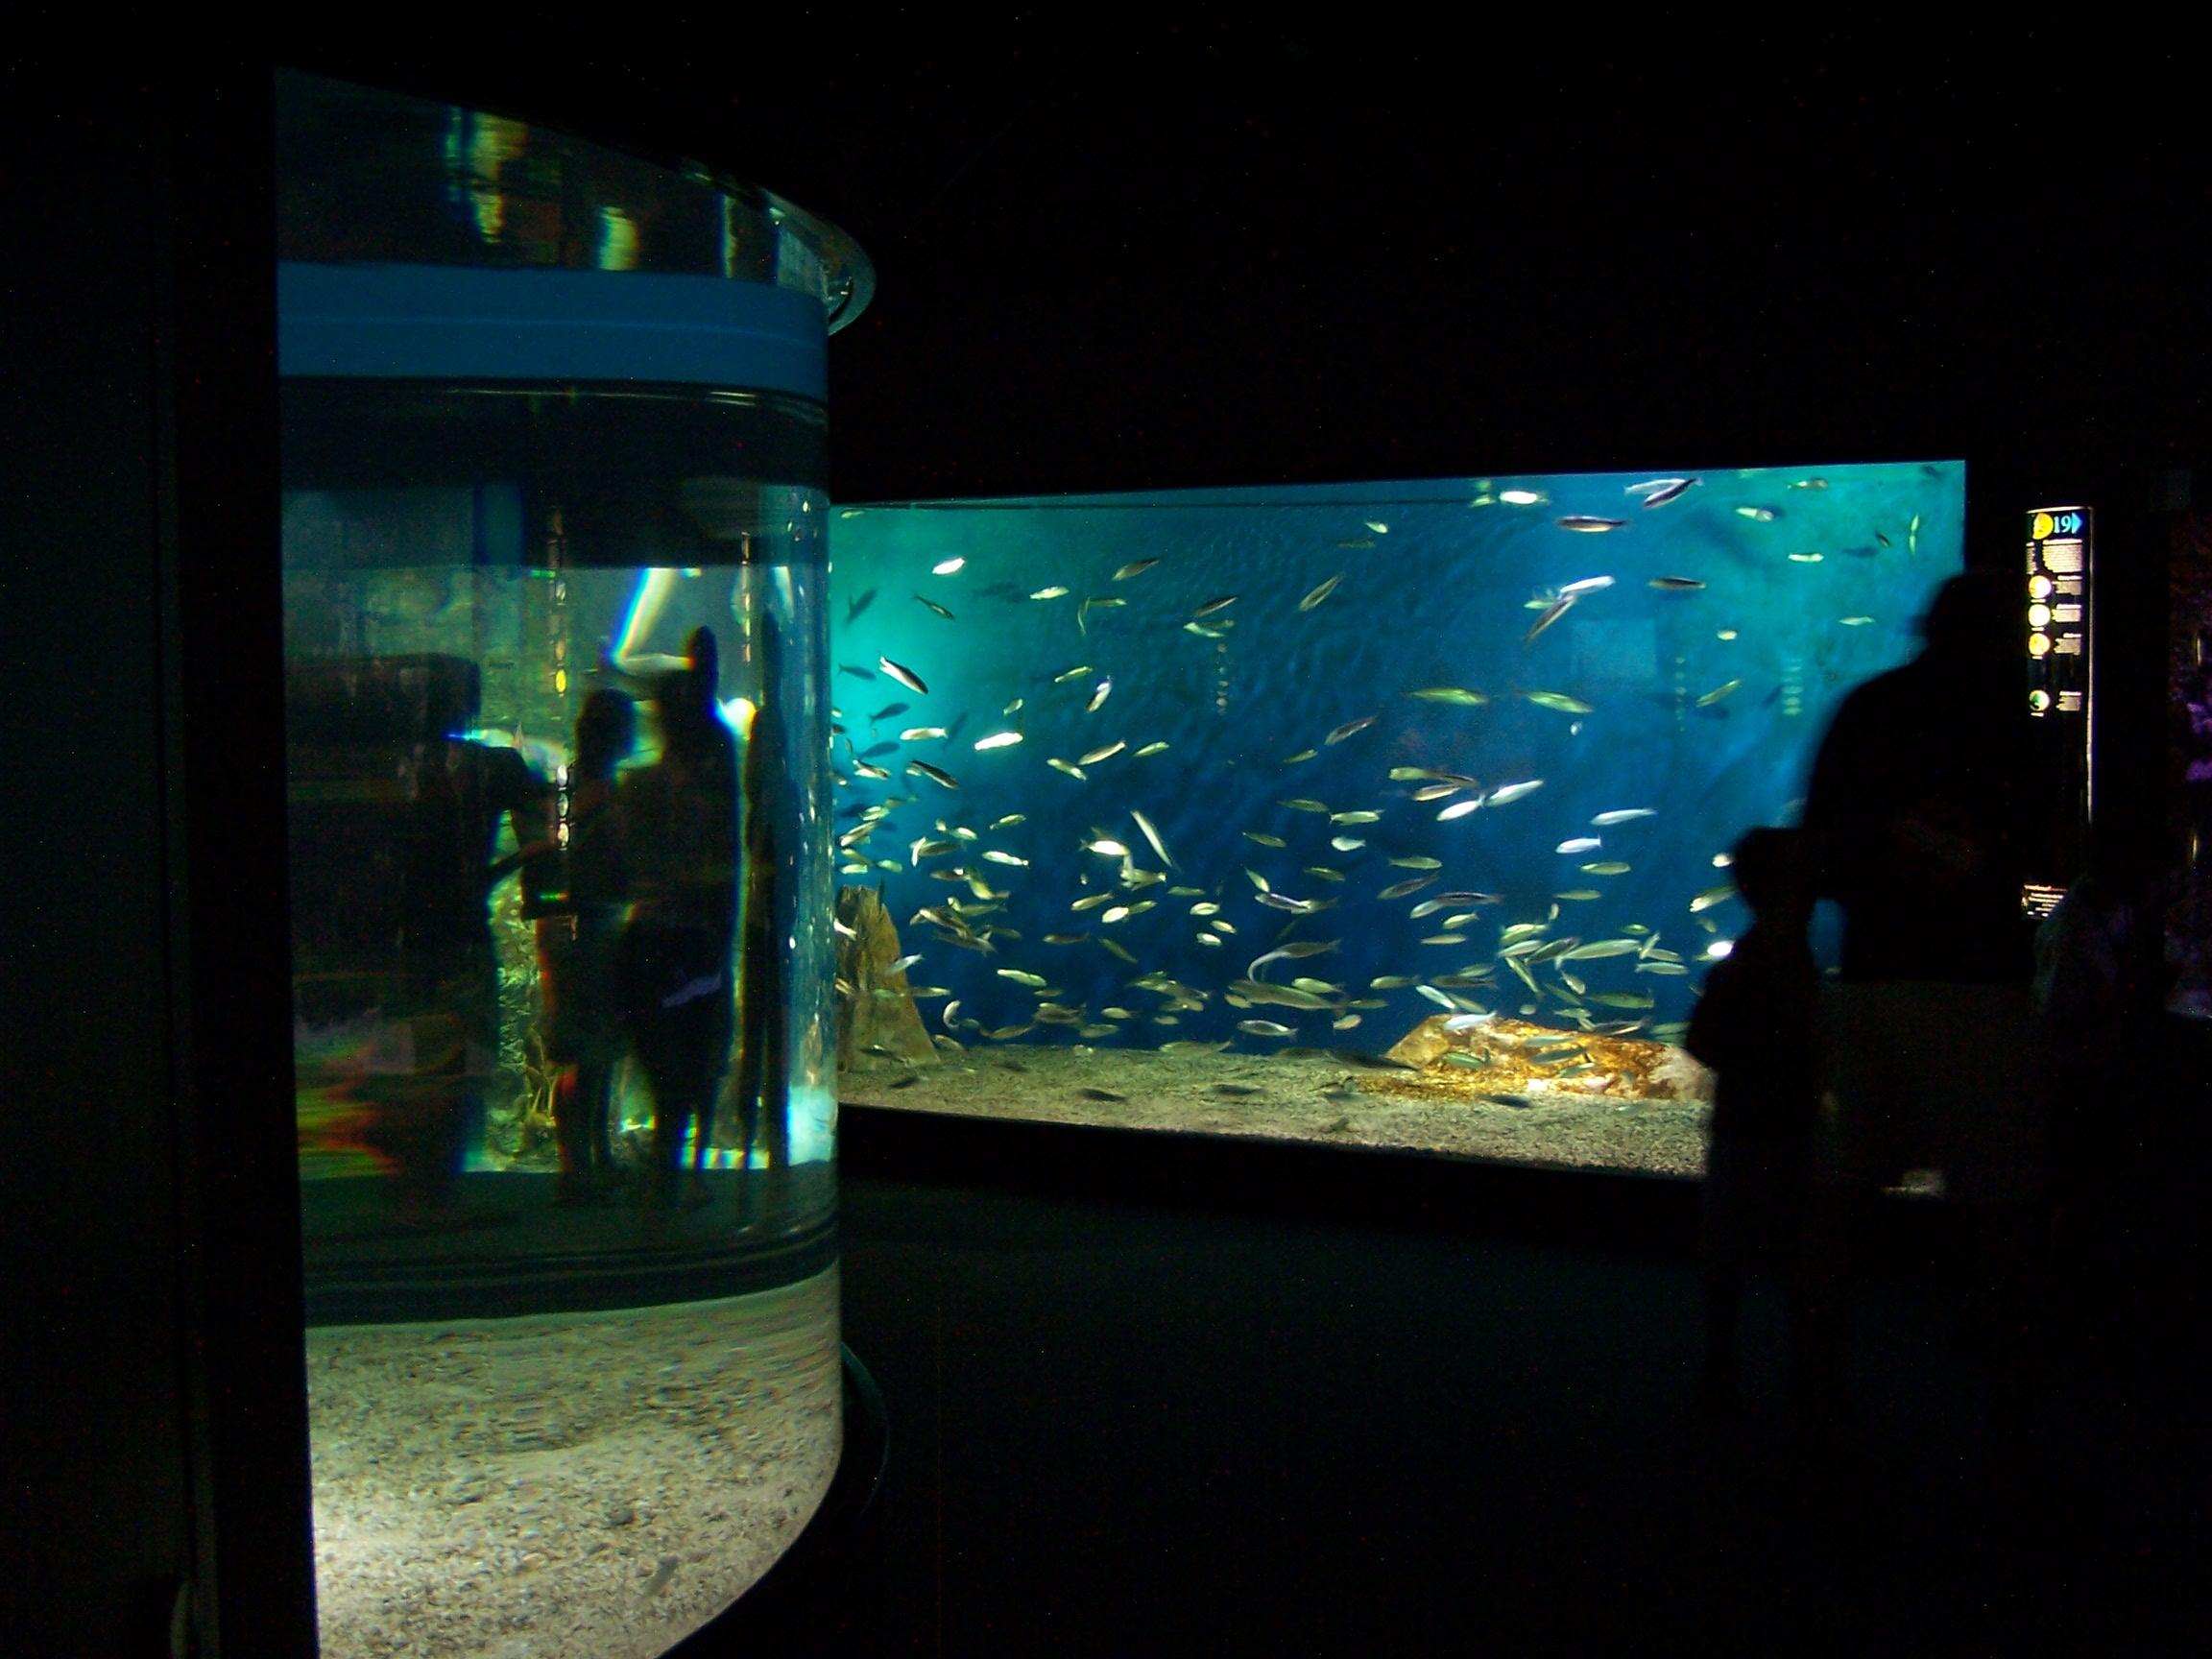 File:Aquarium de La Rochelle - Bassins 003.jpg - Wikimedia Commons